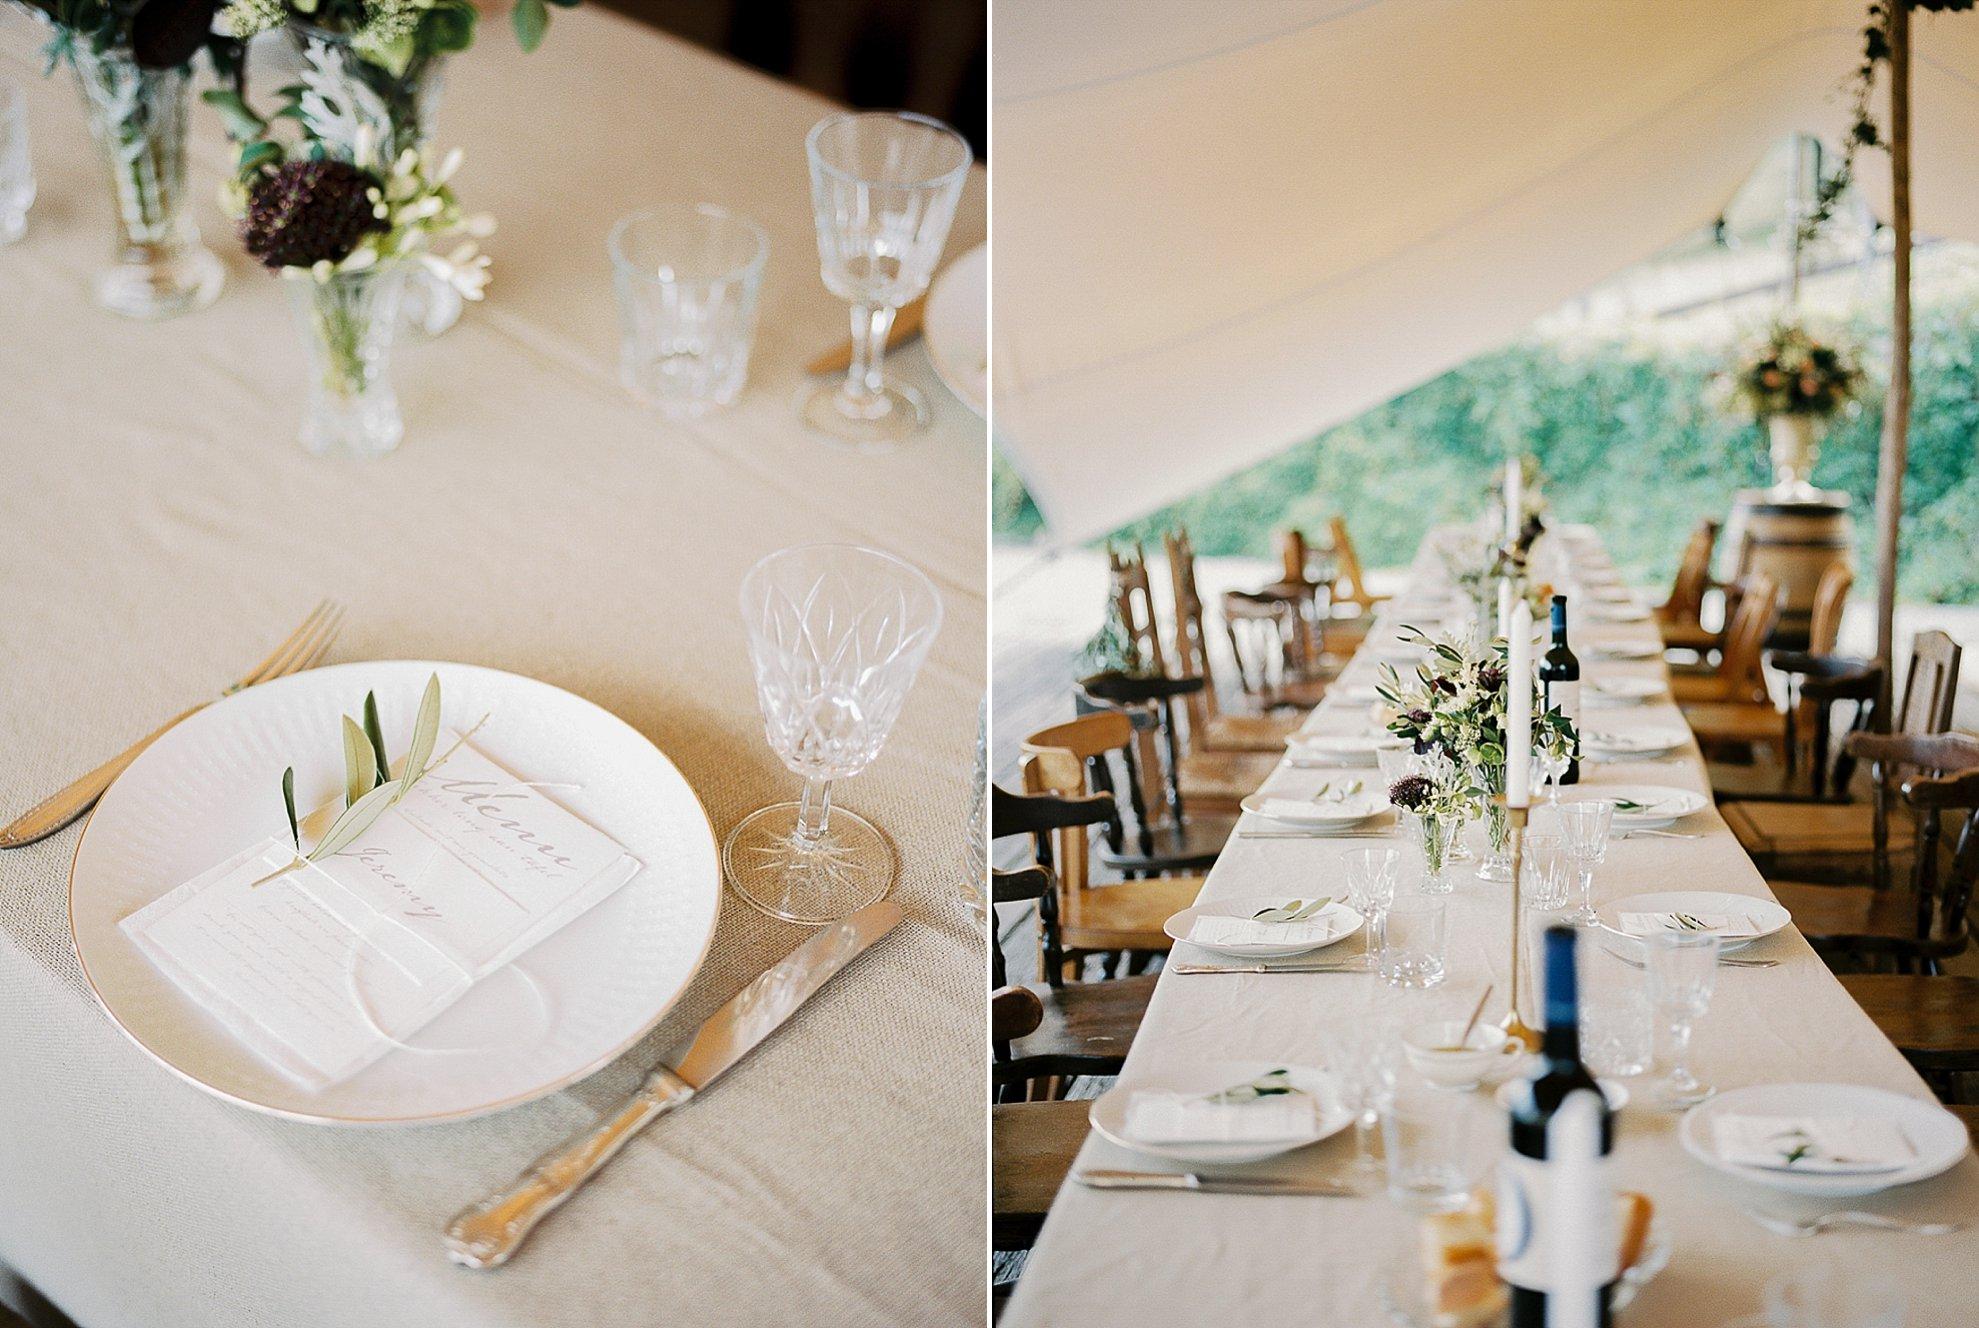 Amanda-Drost-Fotografie-Belgie-Photography-Wedding_0015.jpg